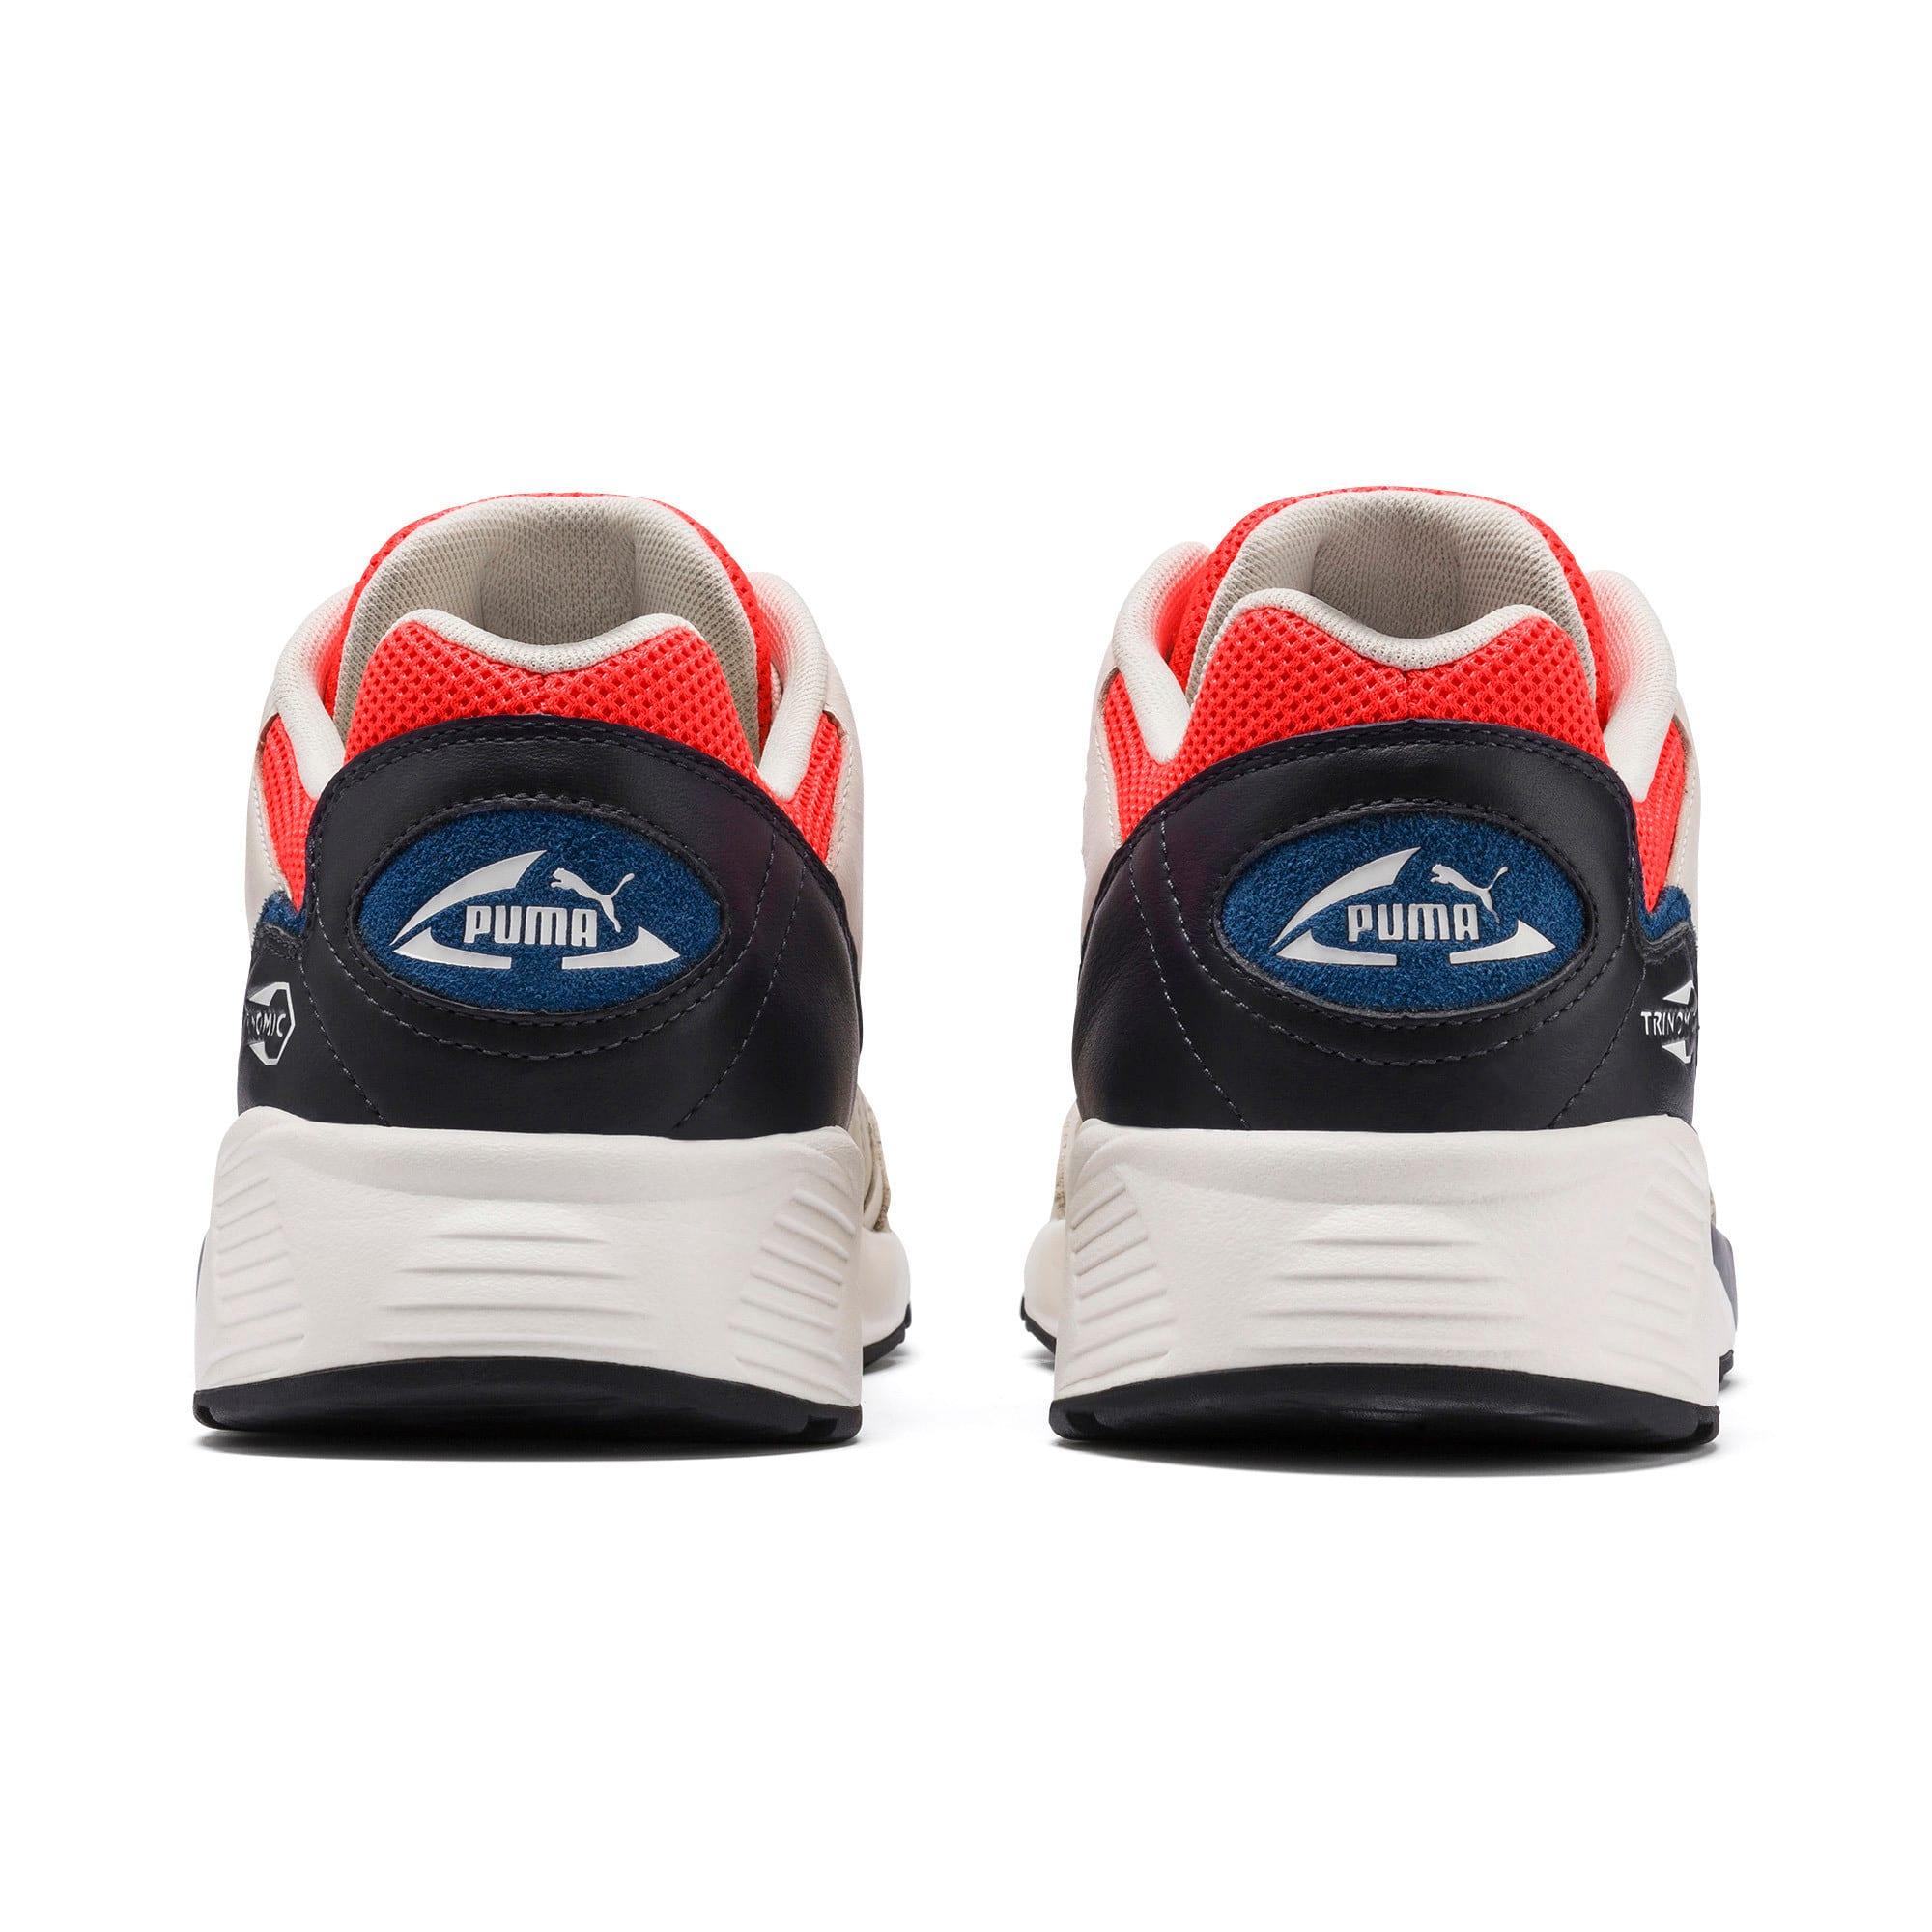 Thumbnail 3 of Prevail Classic Sneakers, Whisper White-Nrgy Red, medium